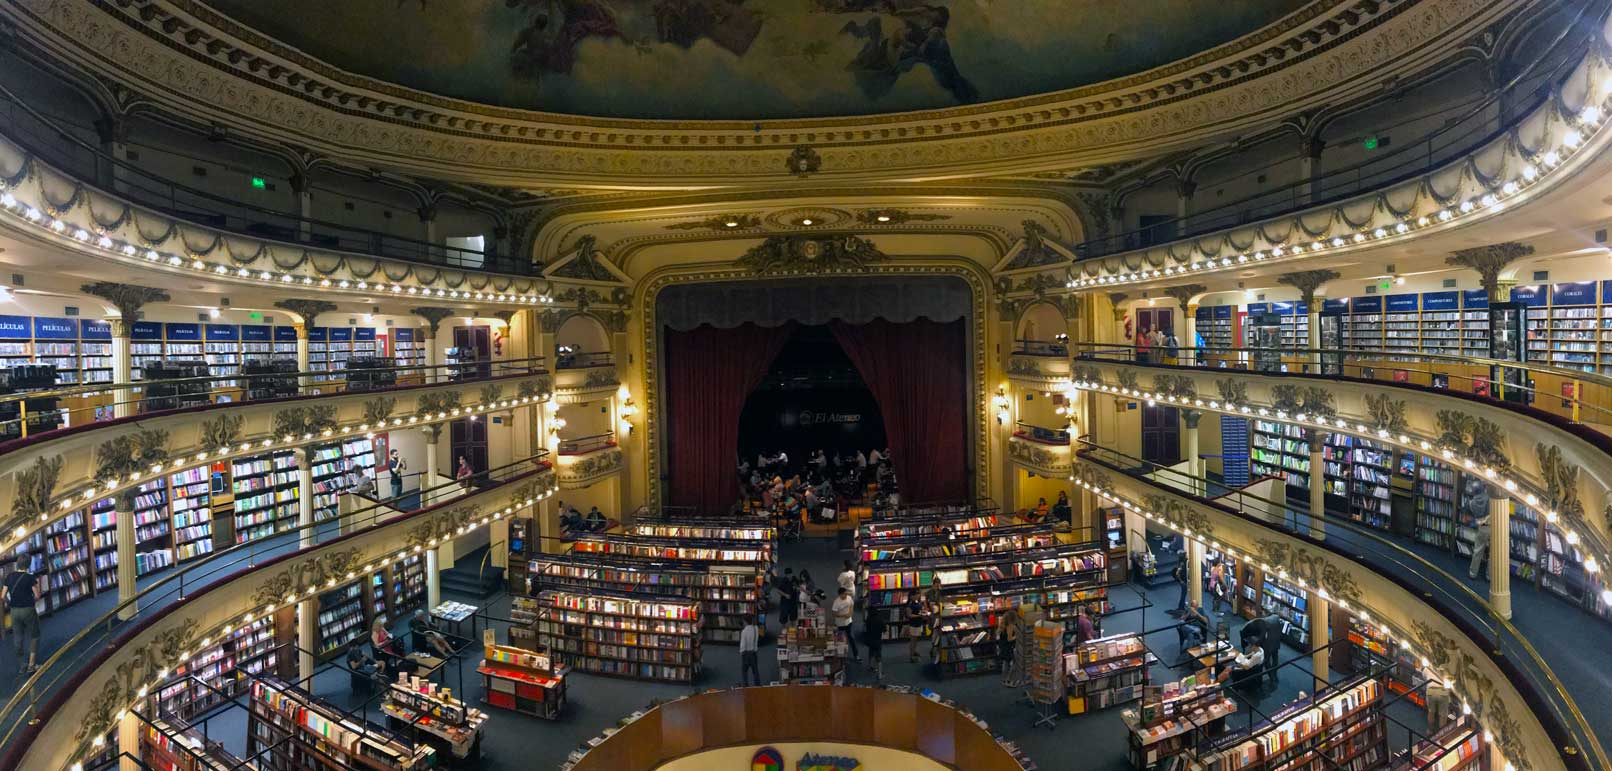 El Ateneo Bookstore Places to visit